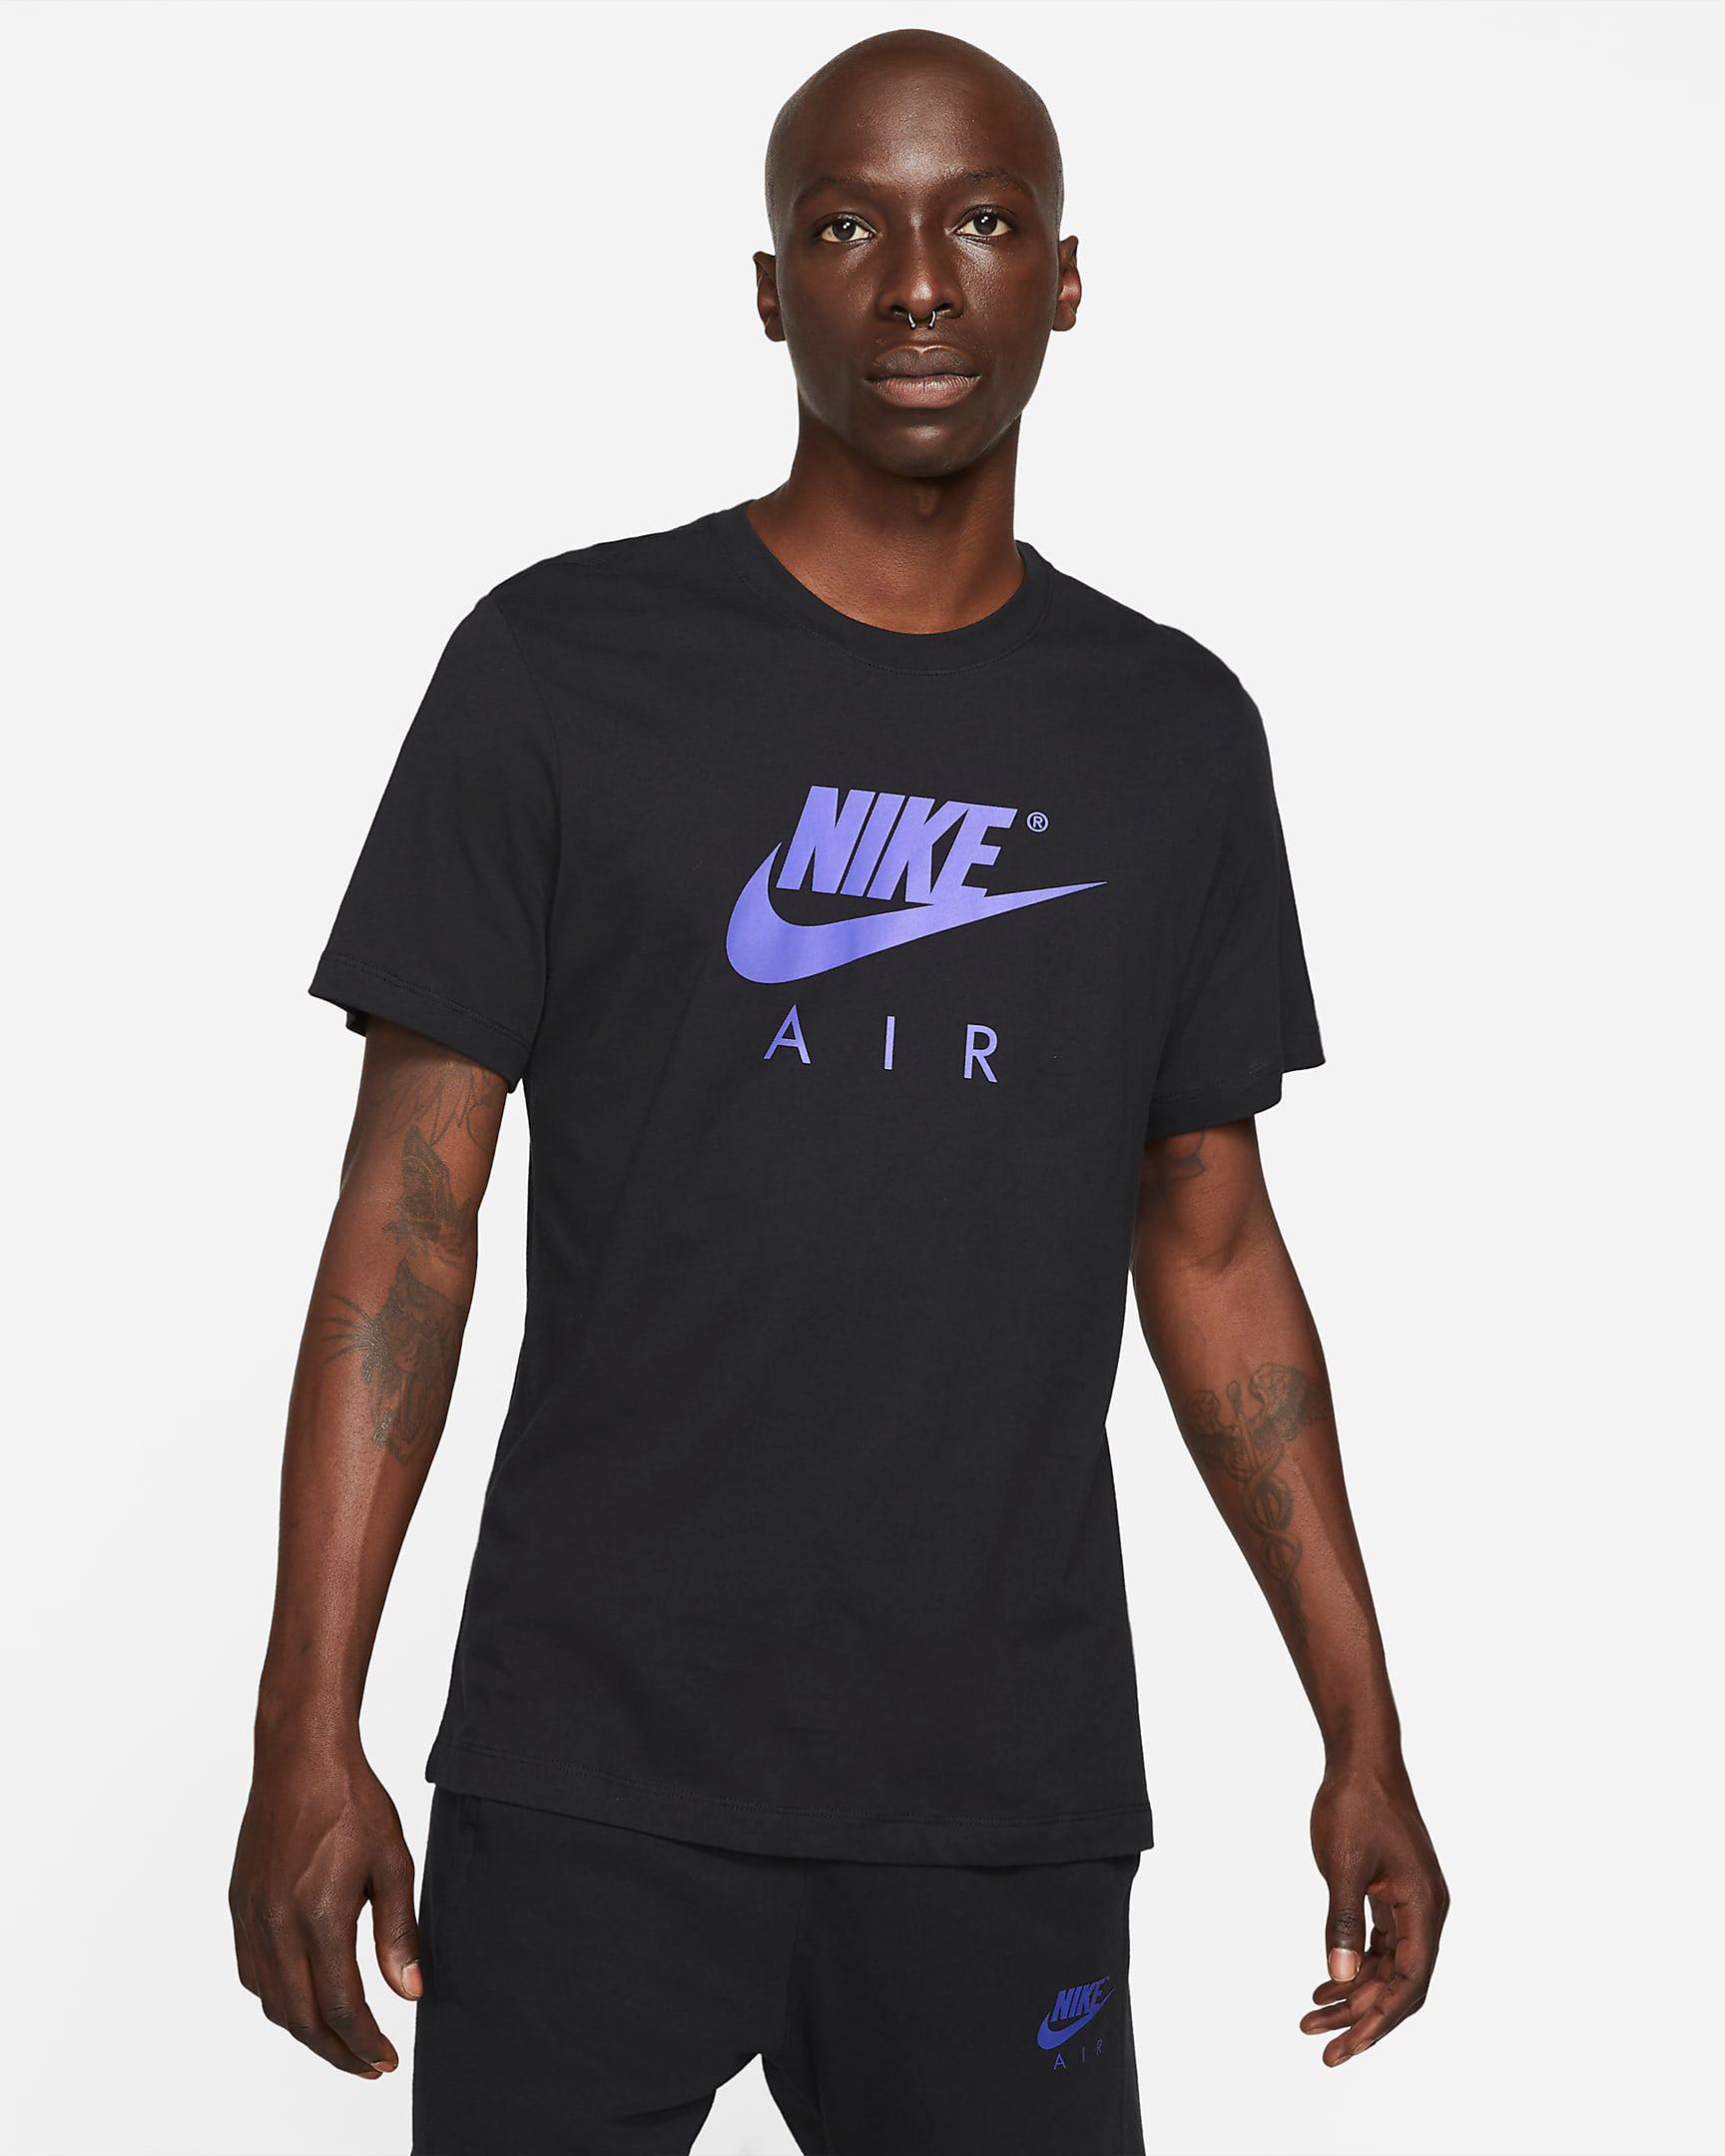 nike-air-persian-violet-logo-shirt